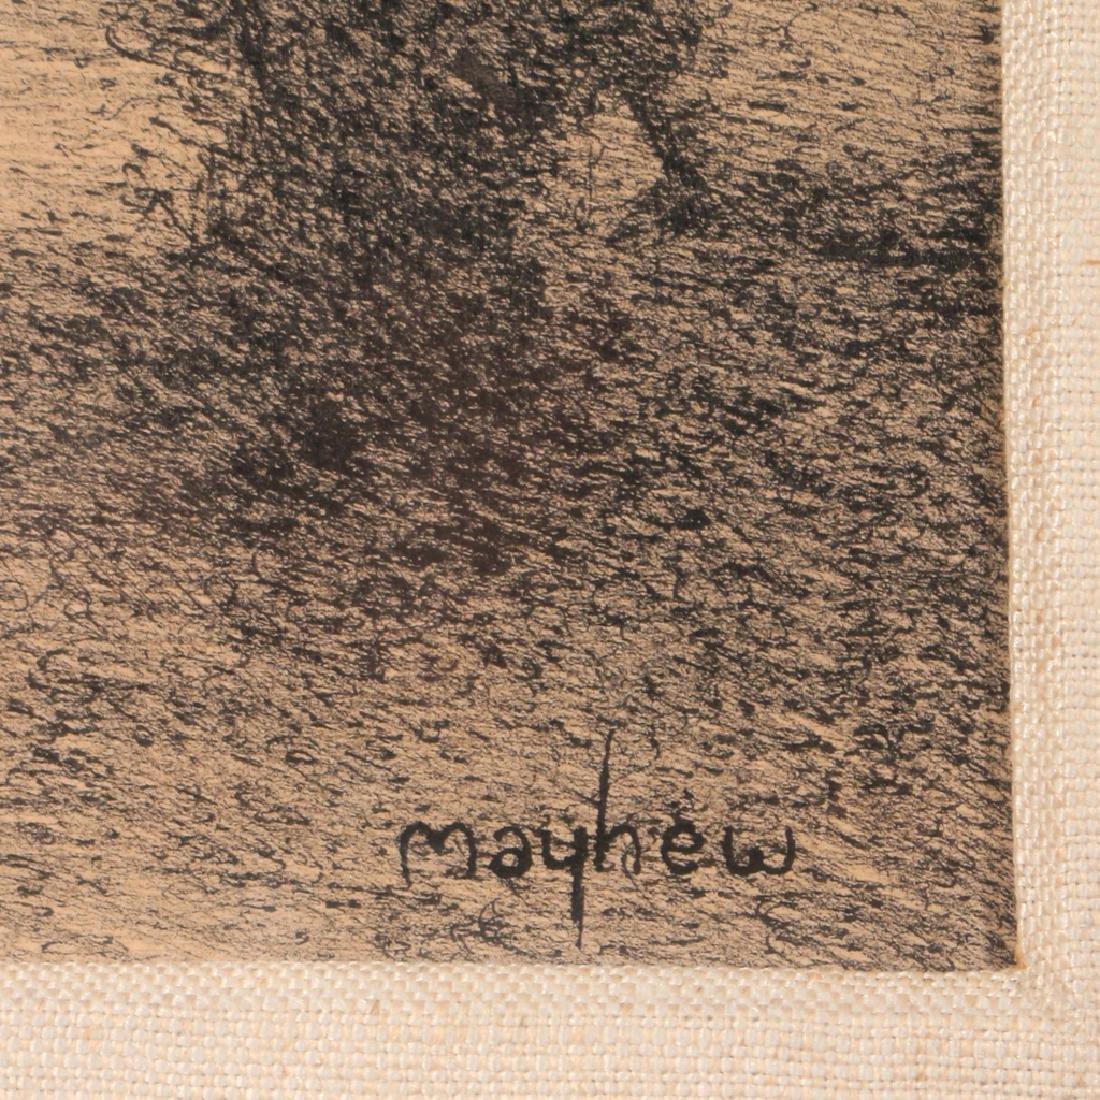 RICHARD MAYHEW (American, 1924-) - 2